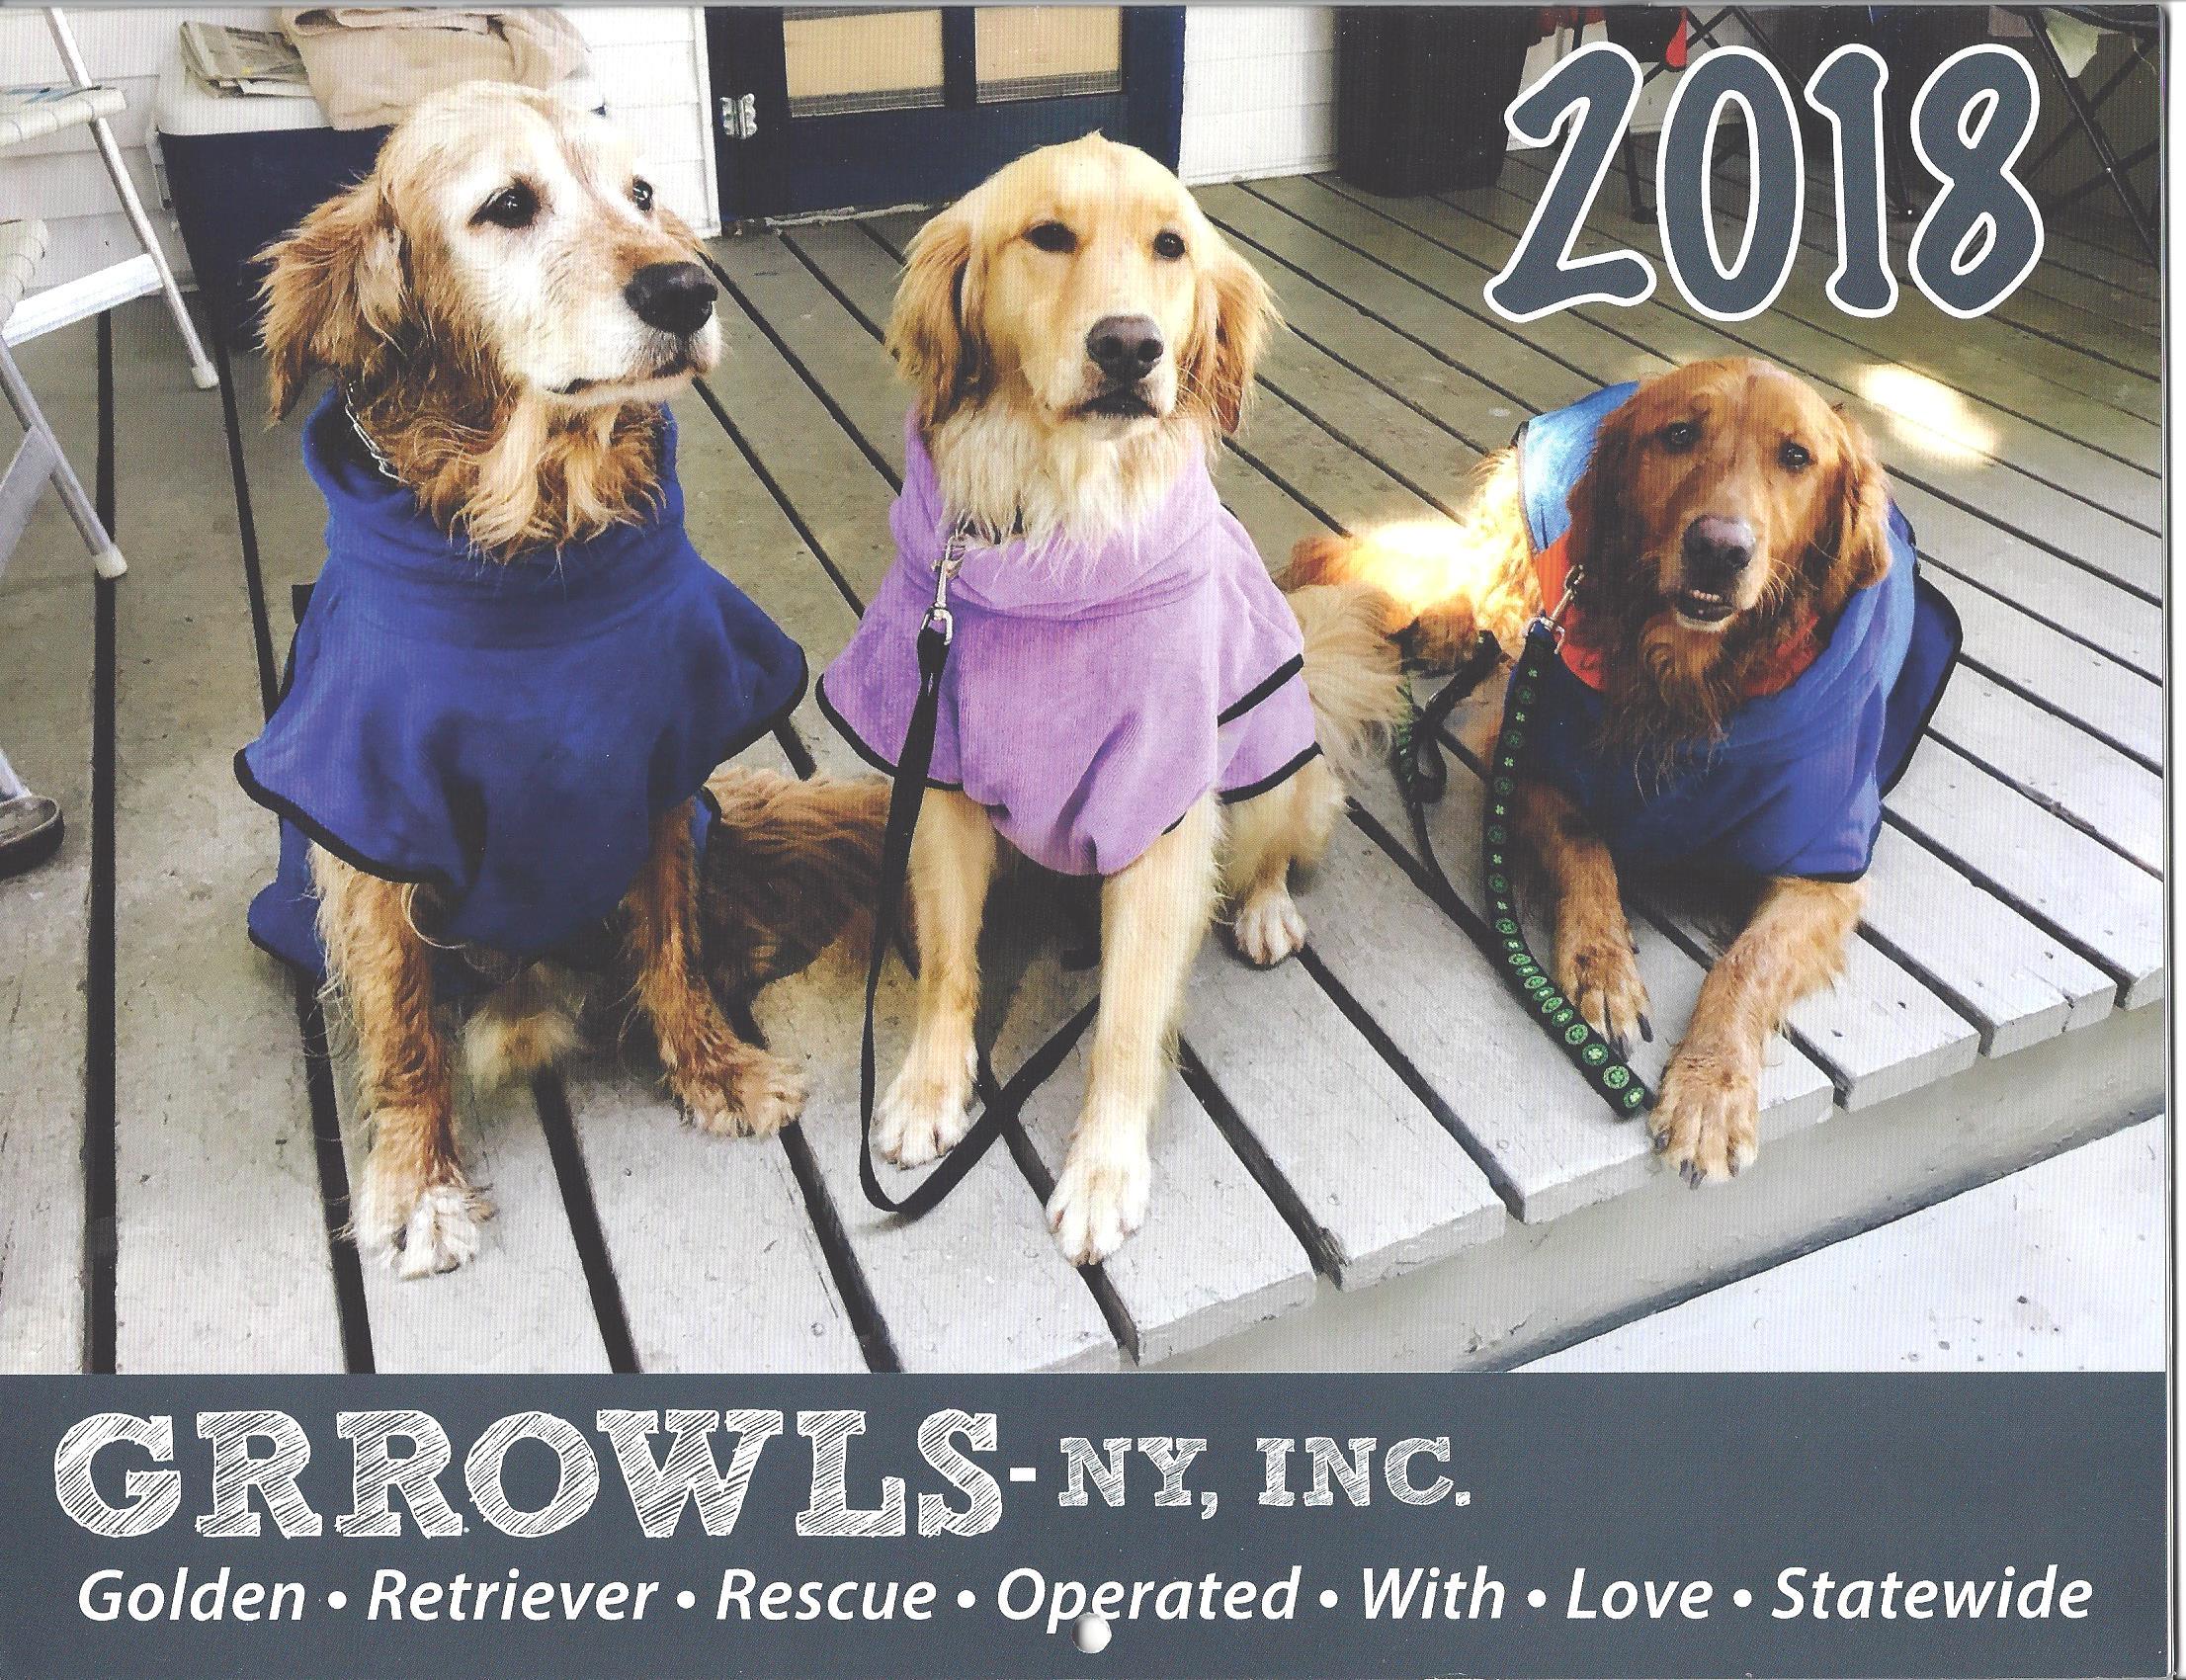 2018 GRROWLS Calendar